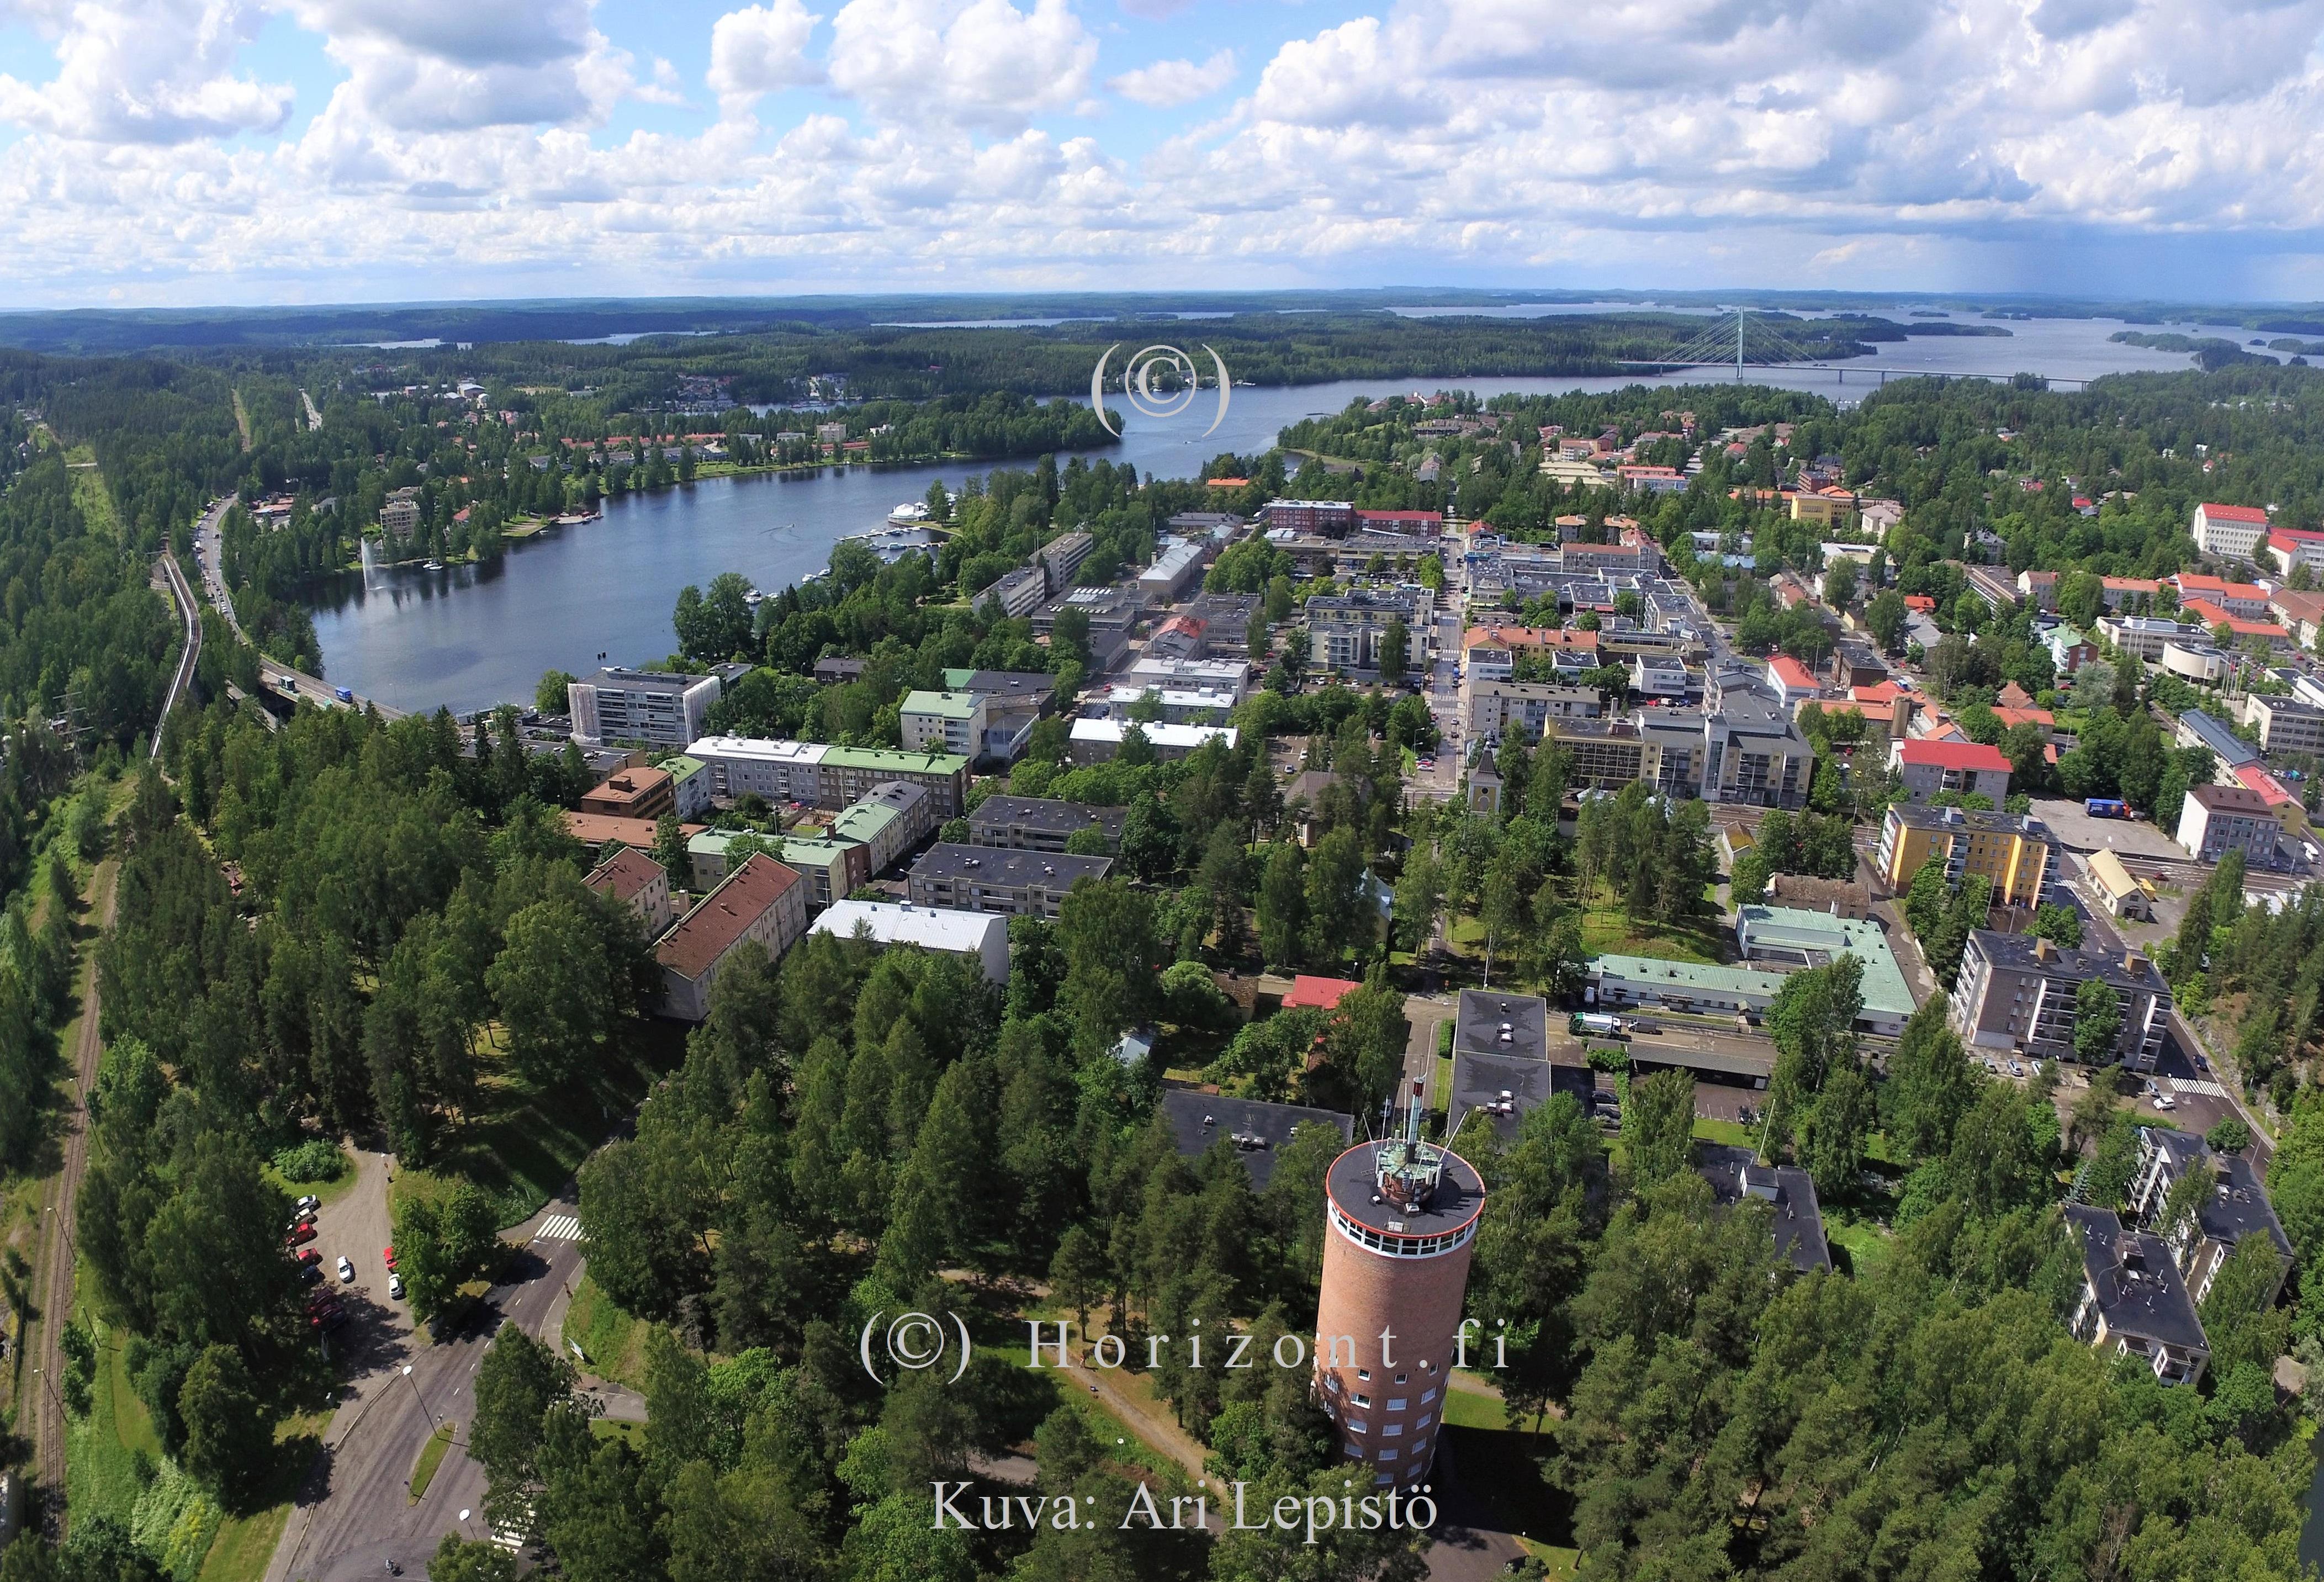 Suomi 24 Heinola